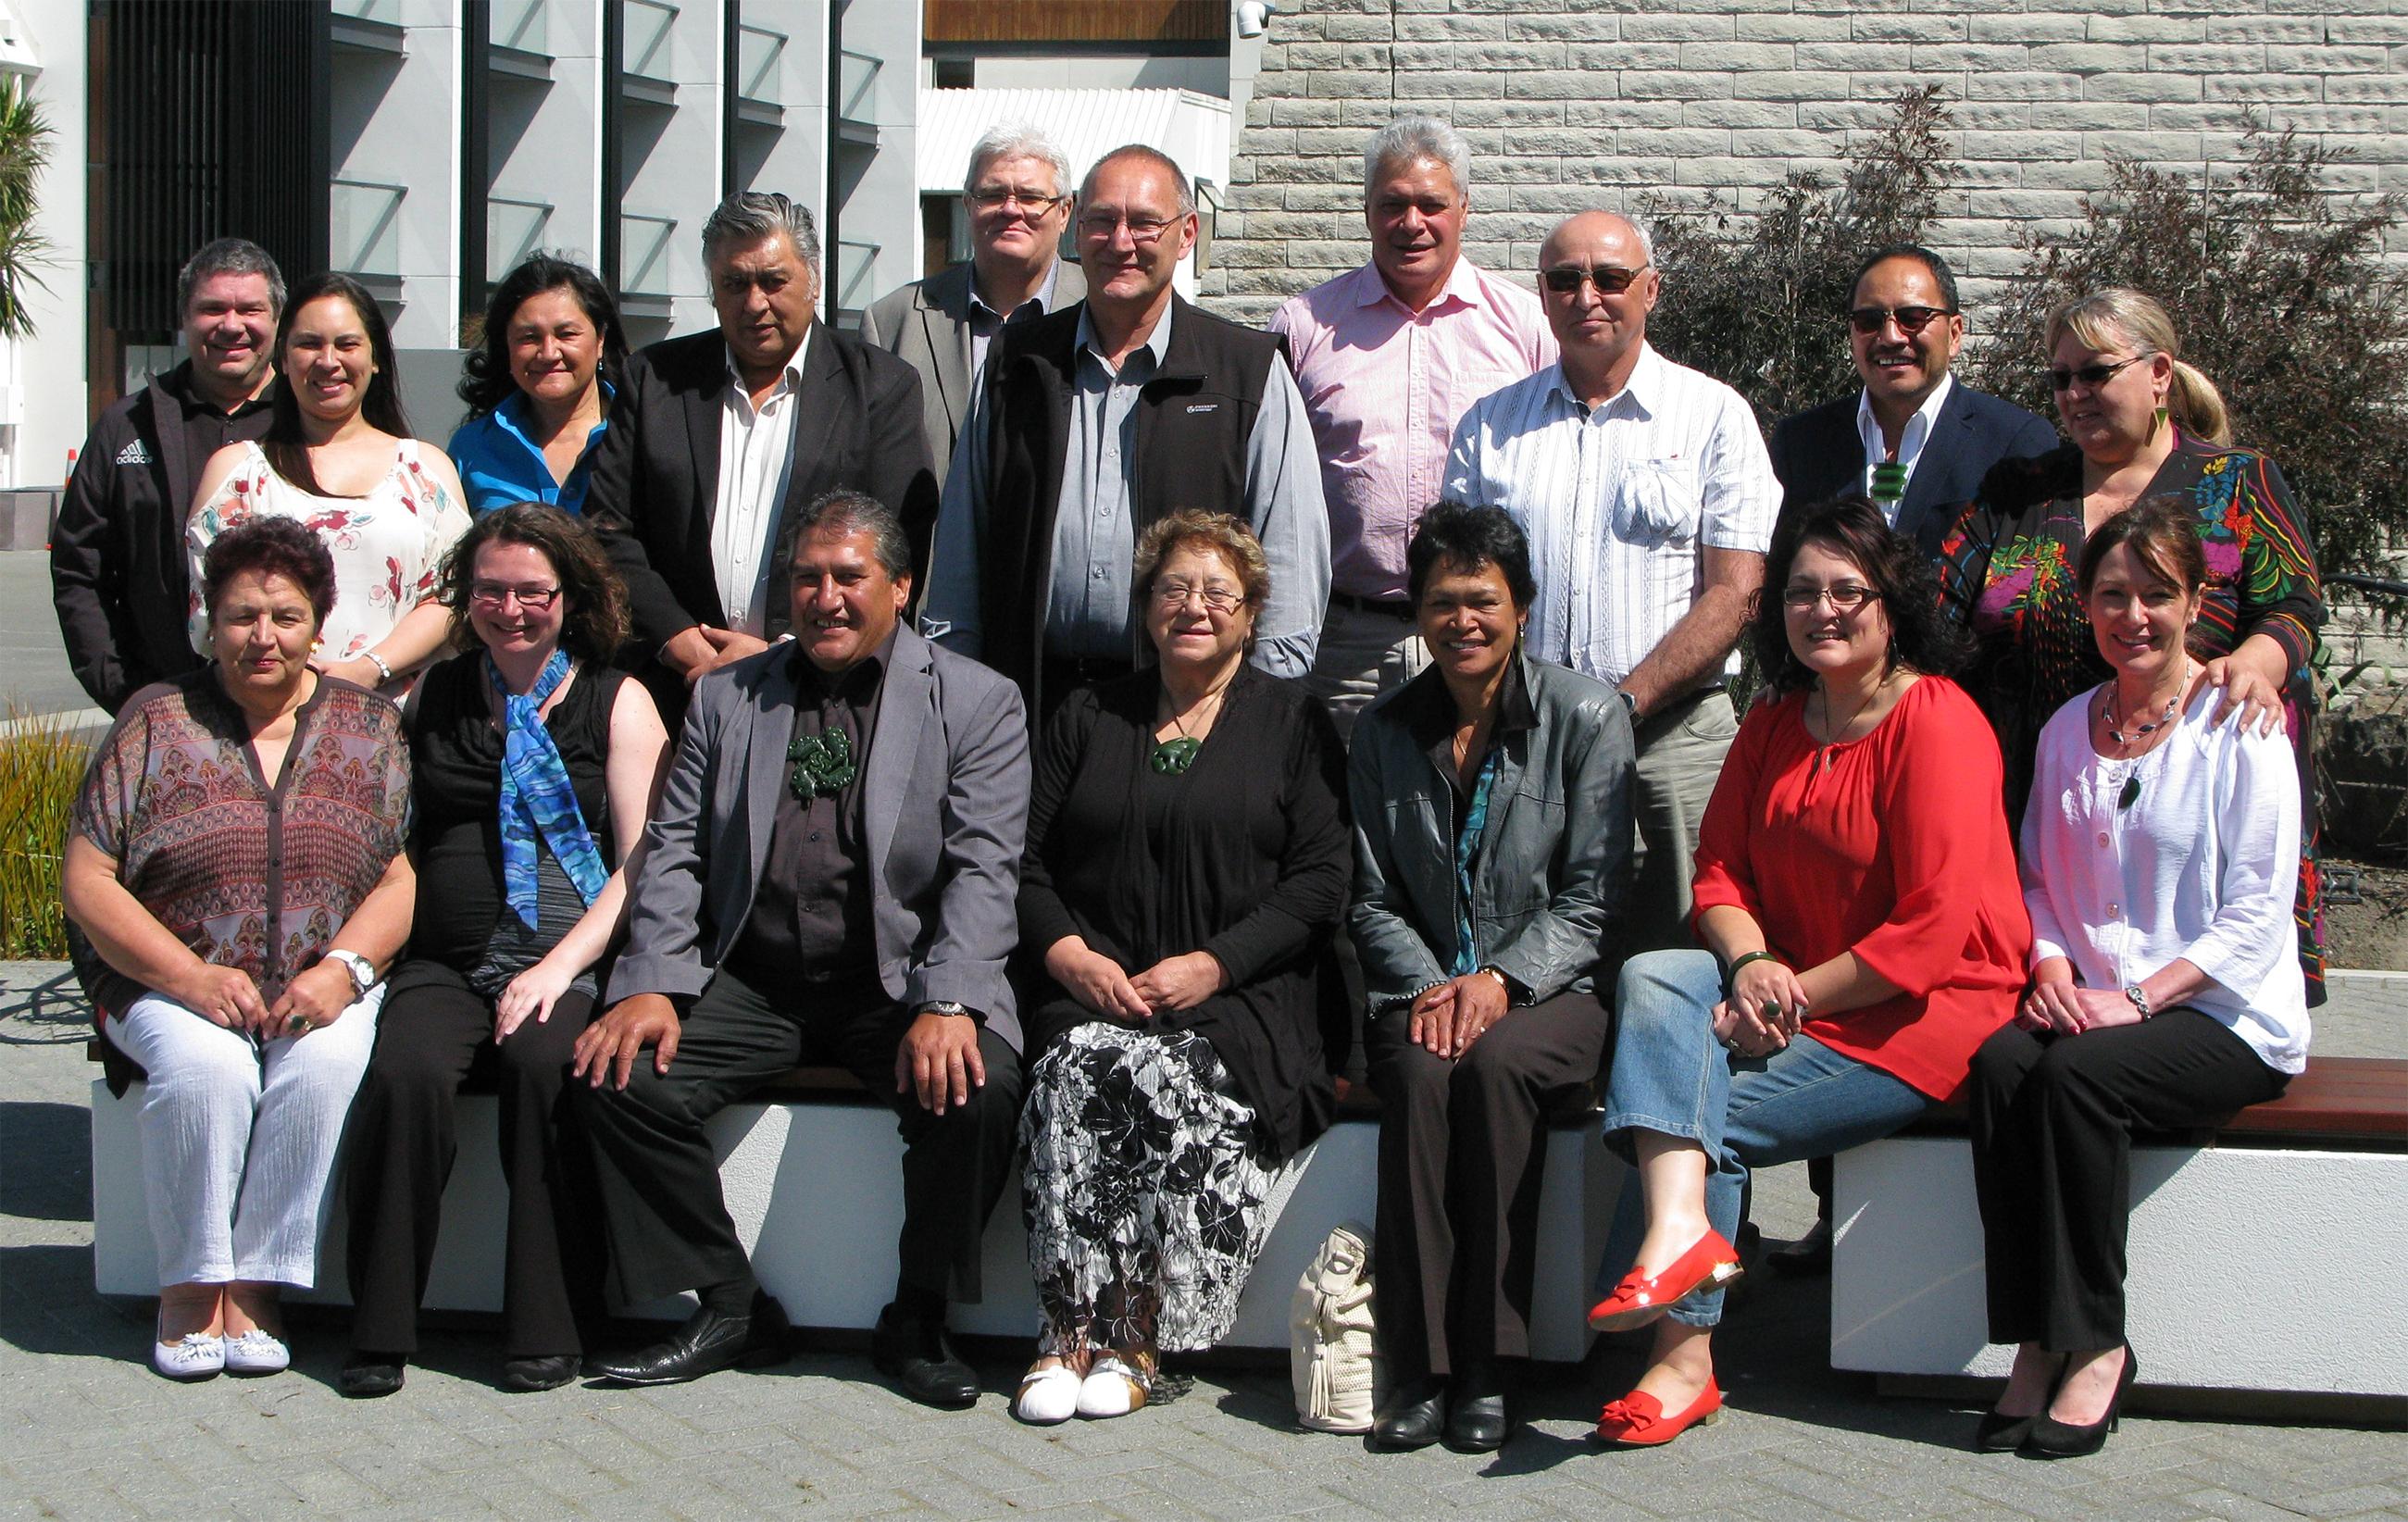 Te Apārangi (Te Rūnanga o Ngāi Tahu committee) met with Ngāti Kahungunu in October last year to discuss the Ruataniwha Dam proposal. Tā Mark Solomon subsequently attended some of the hearings on the dam.